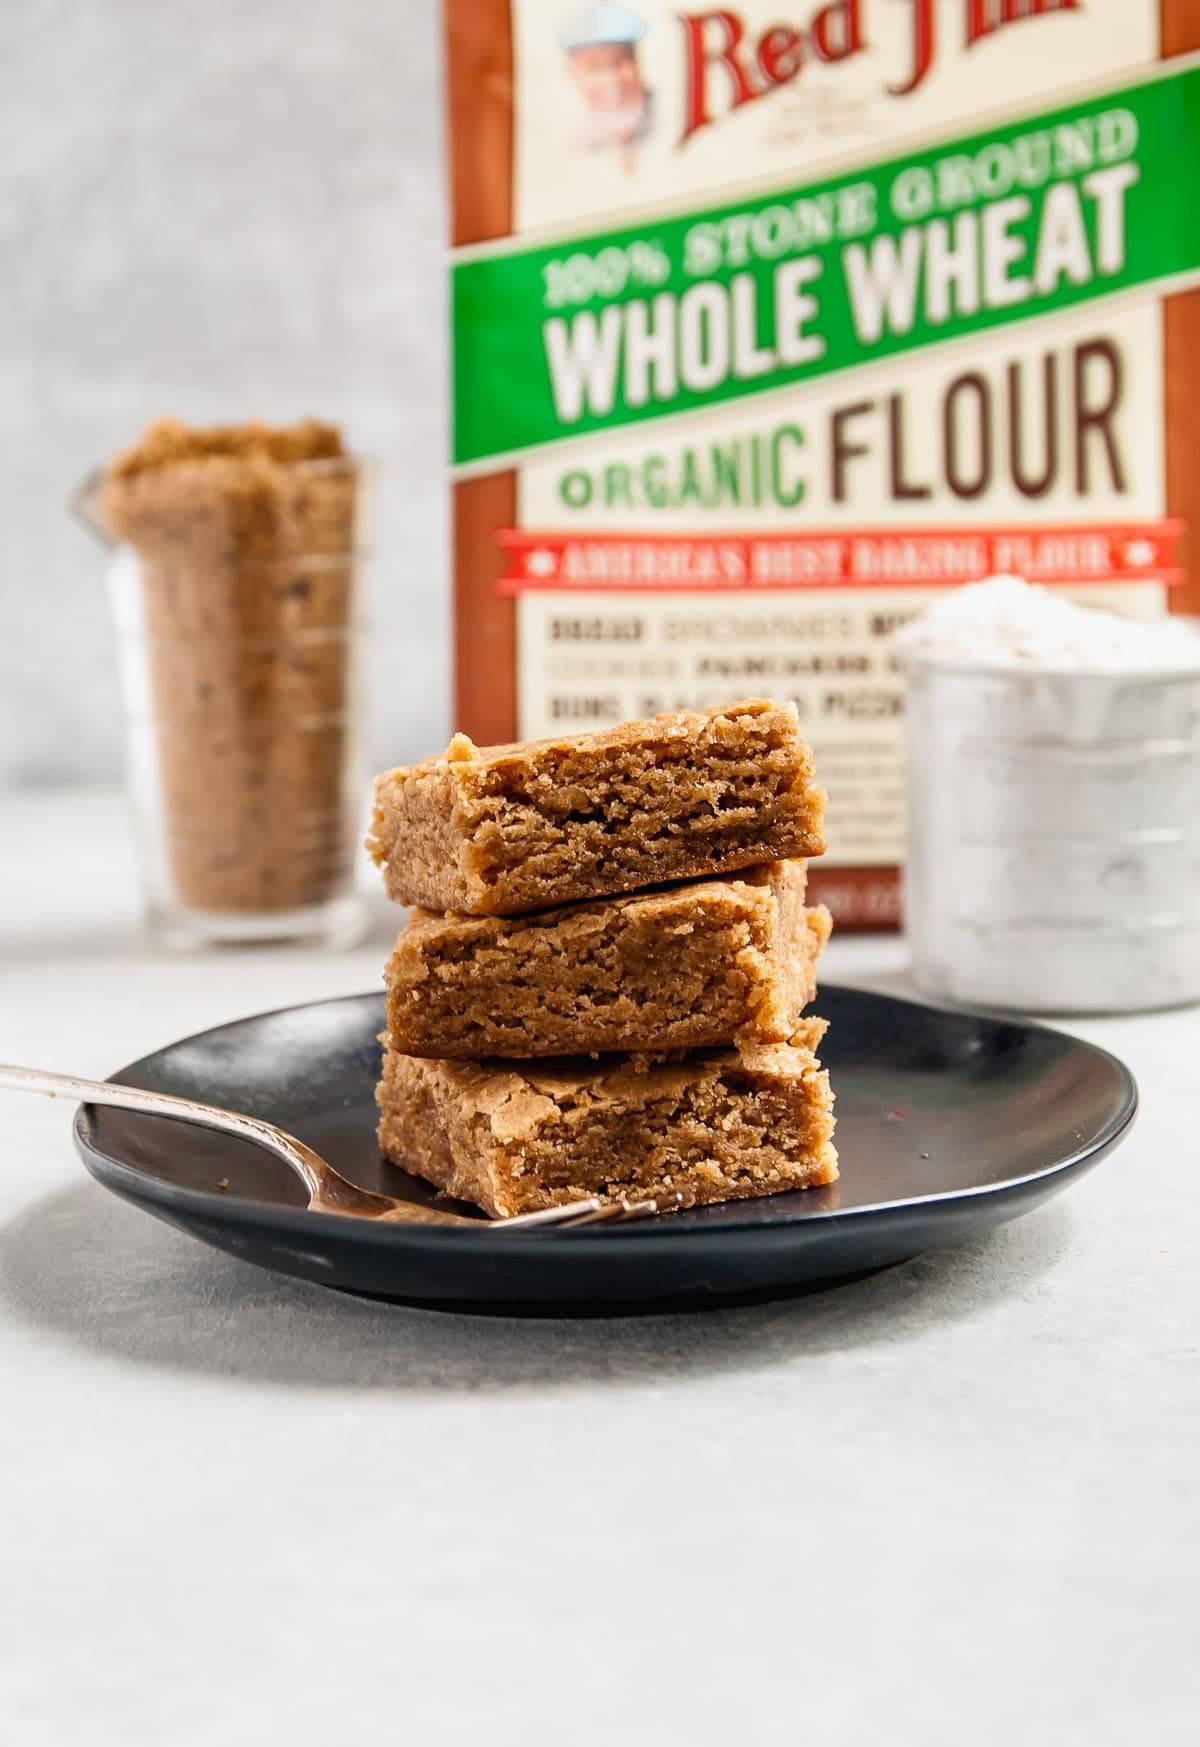 Whole Wheat Vegan Blondies on plate